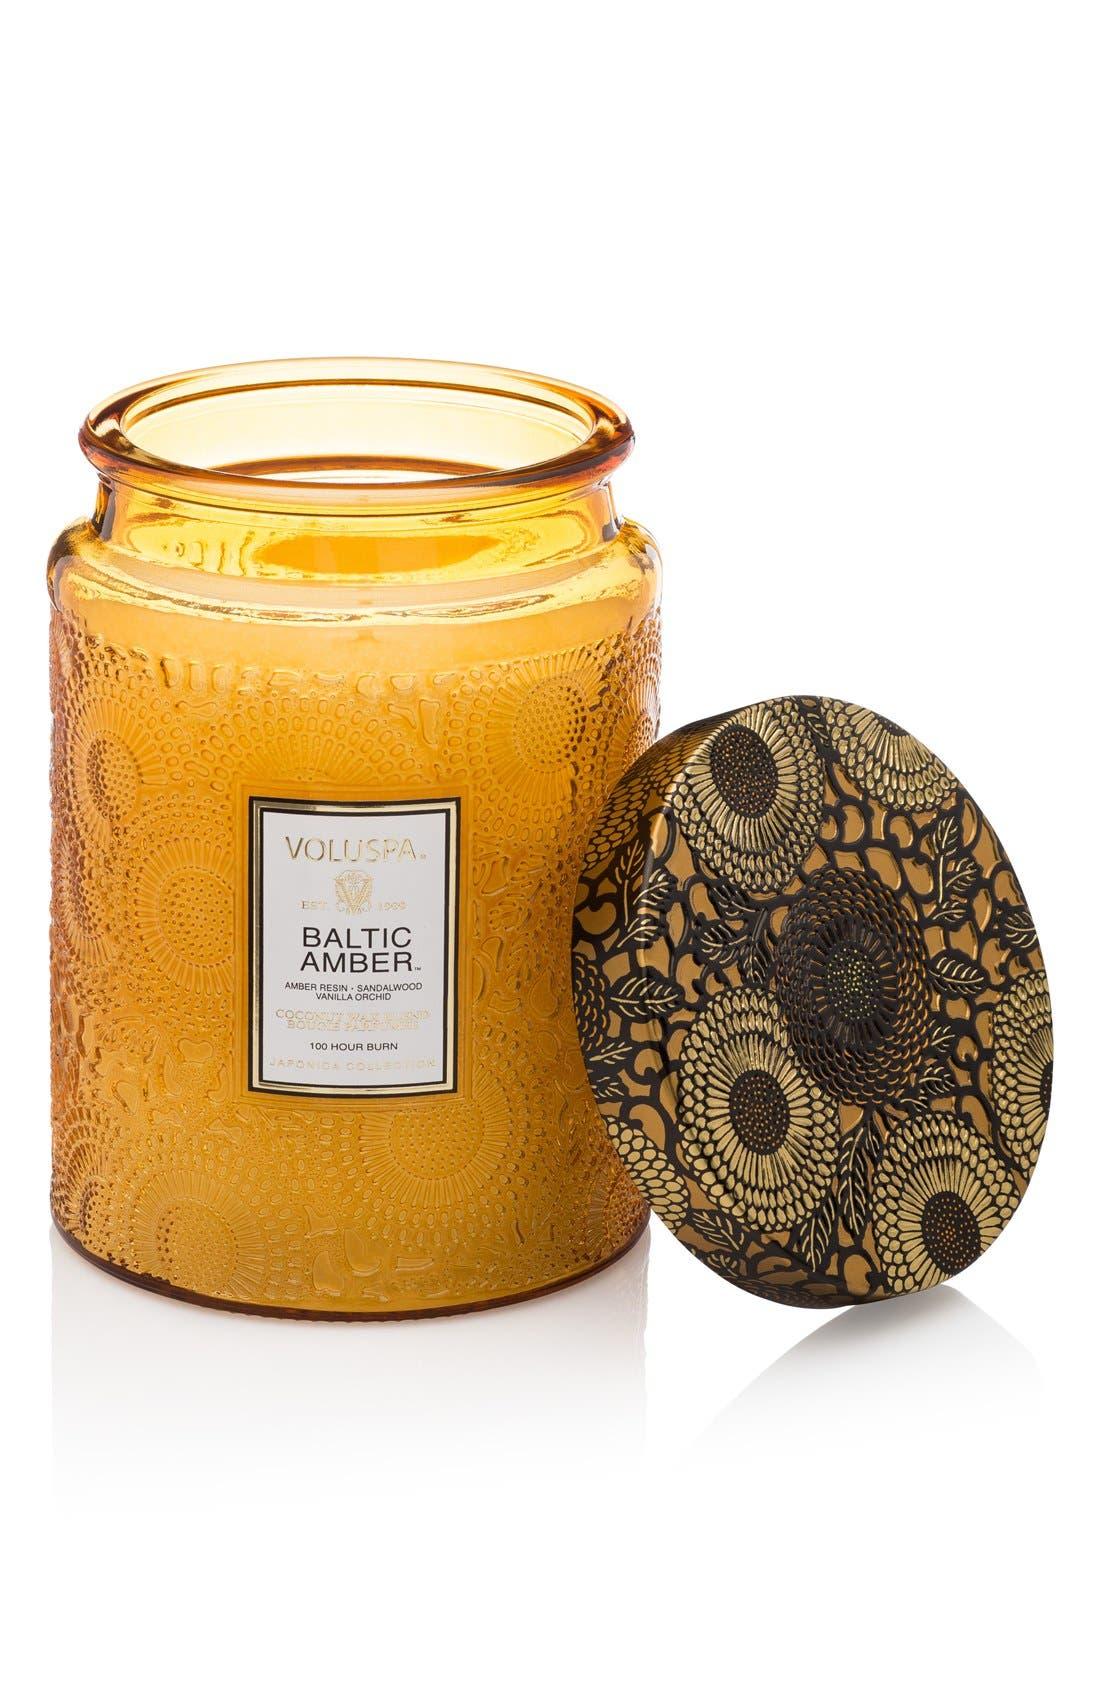 Alternate Image 1 Selected - Voluspa Japonica Baltic Amber LargeGlass Jar Candle